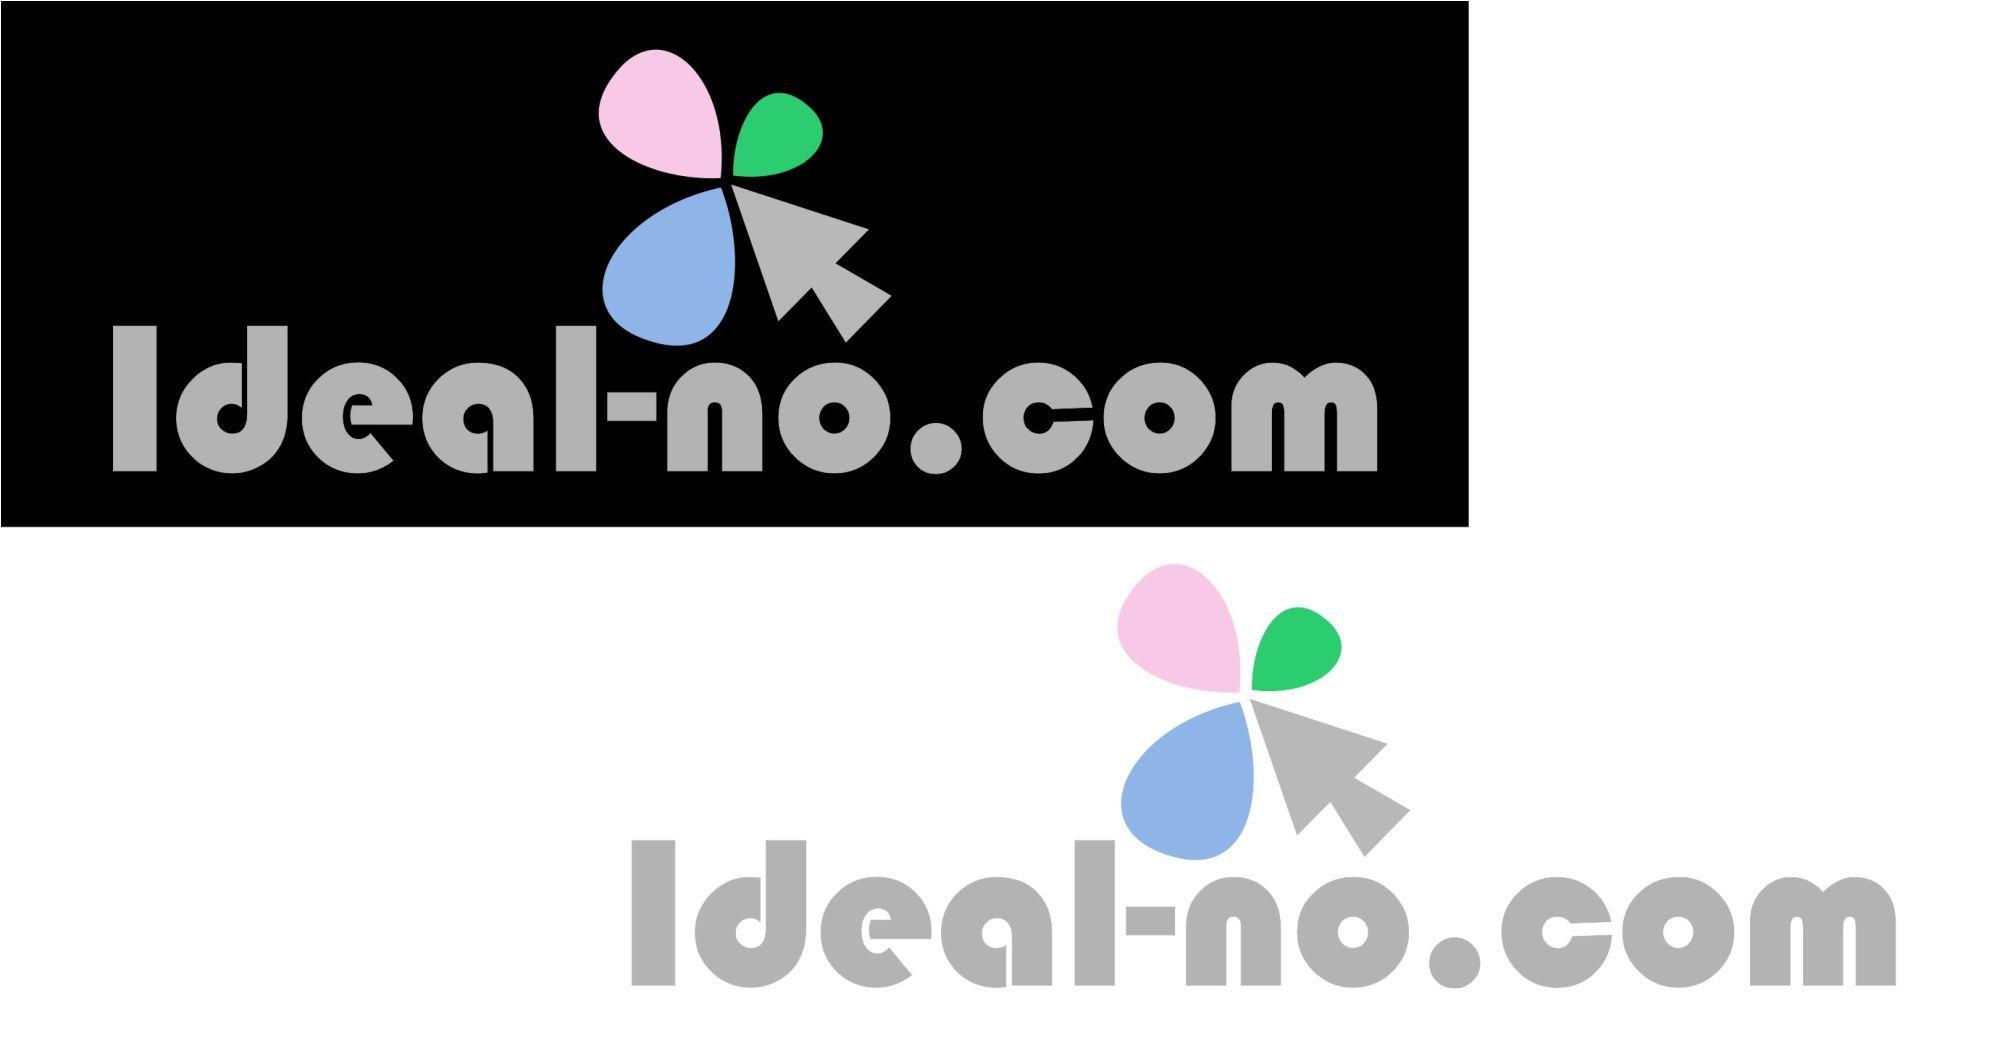 Логотип ideal-no.com - дизайнер Harnara